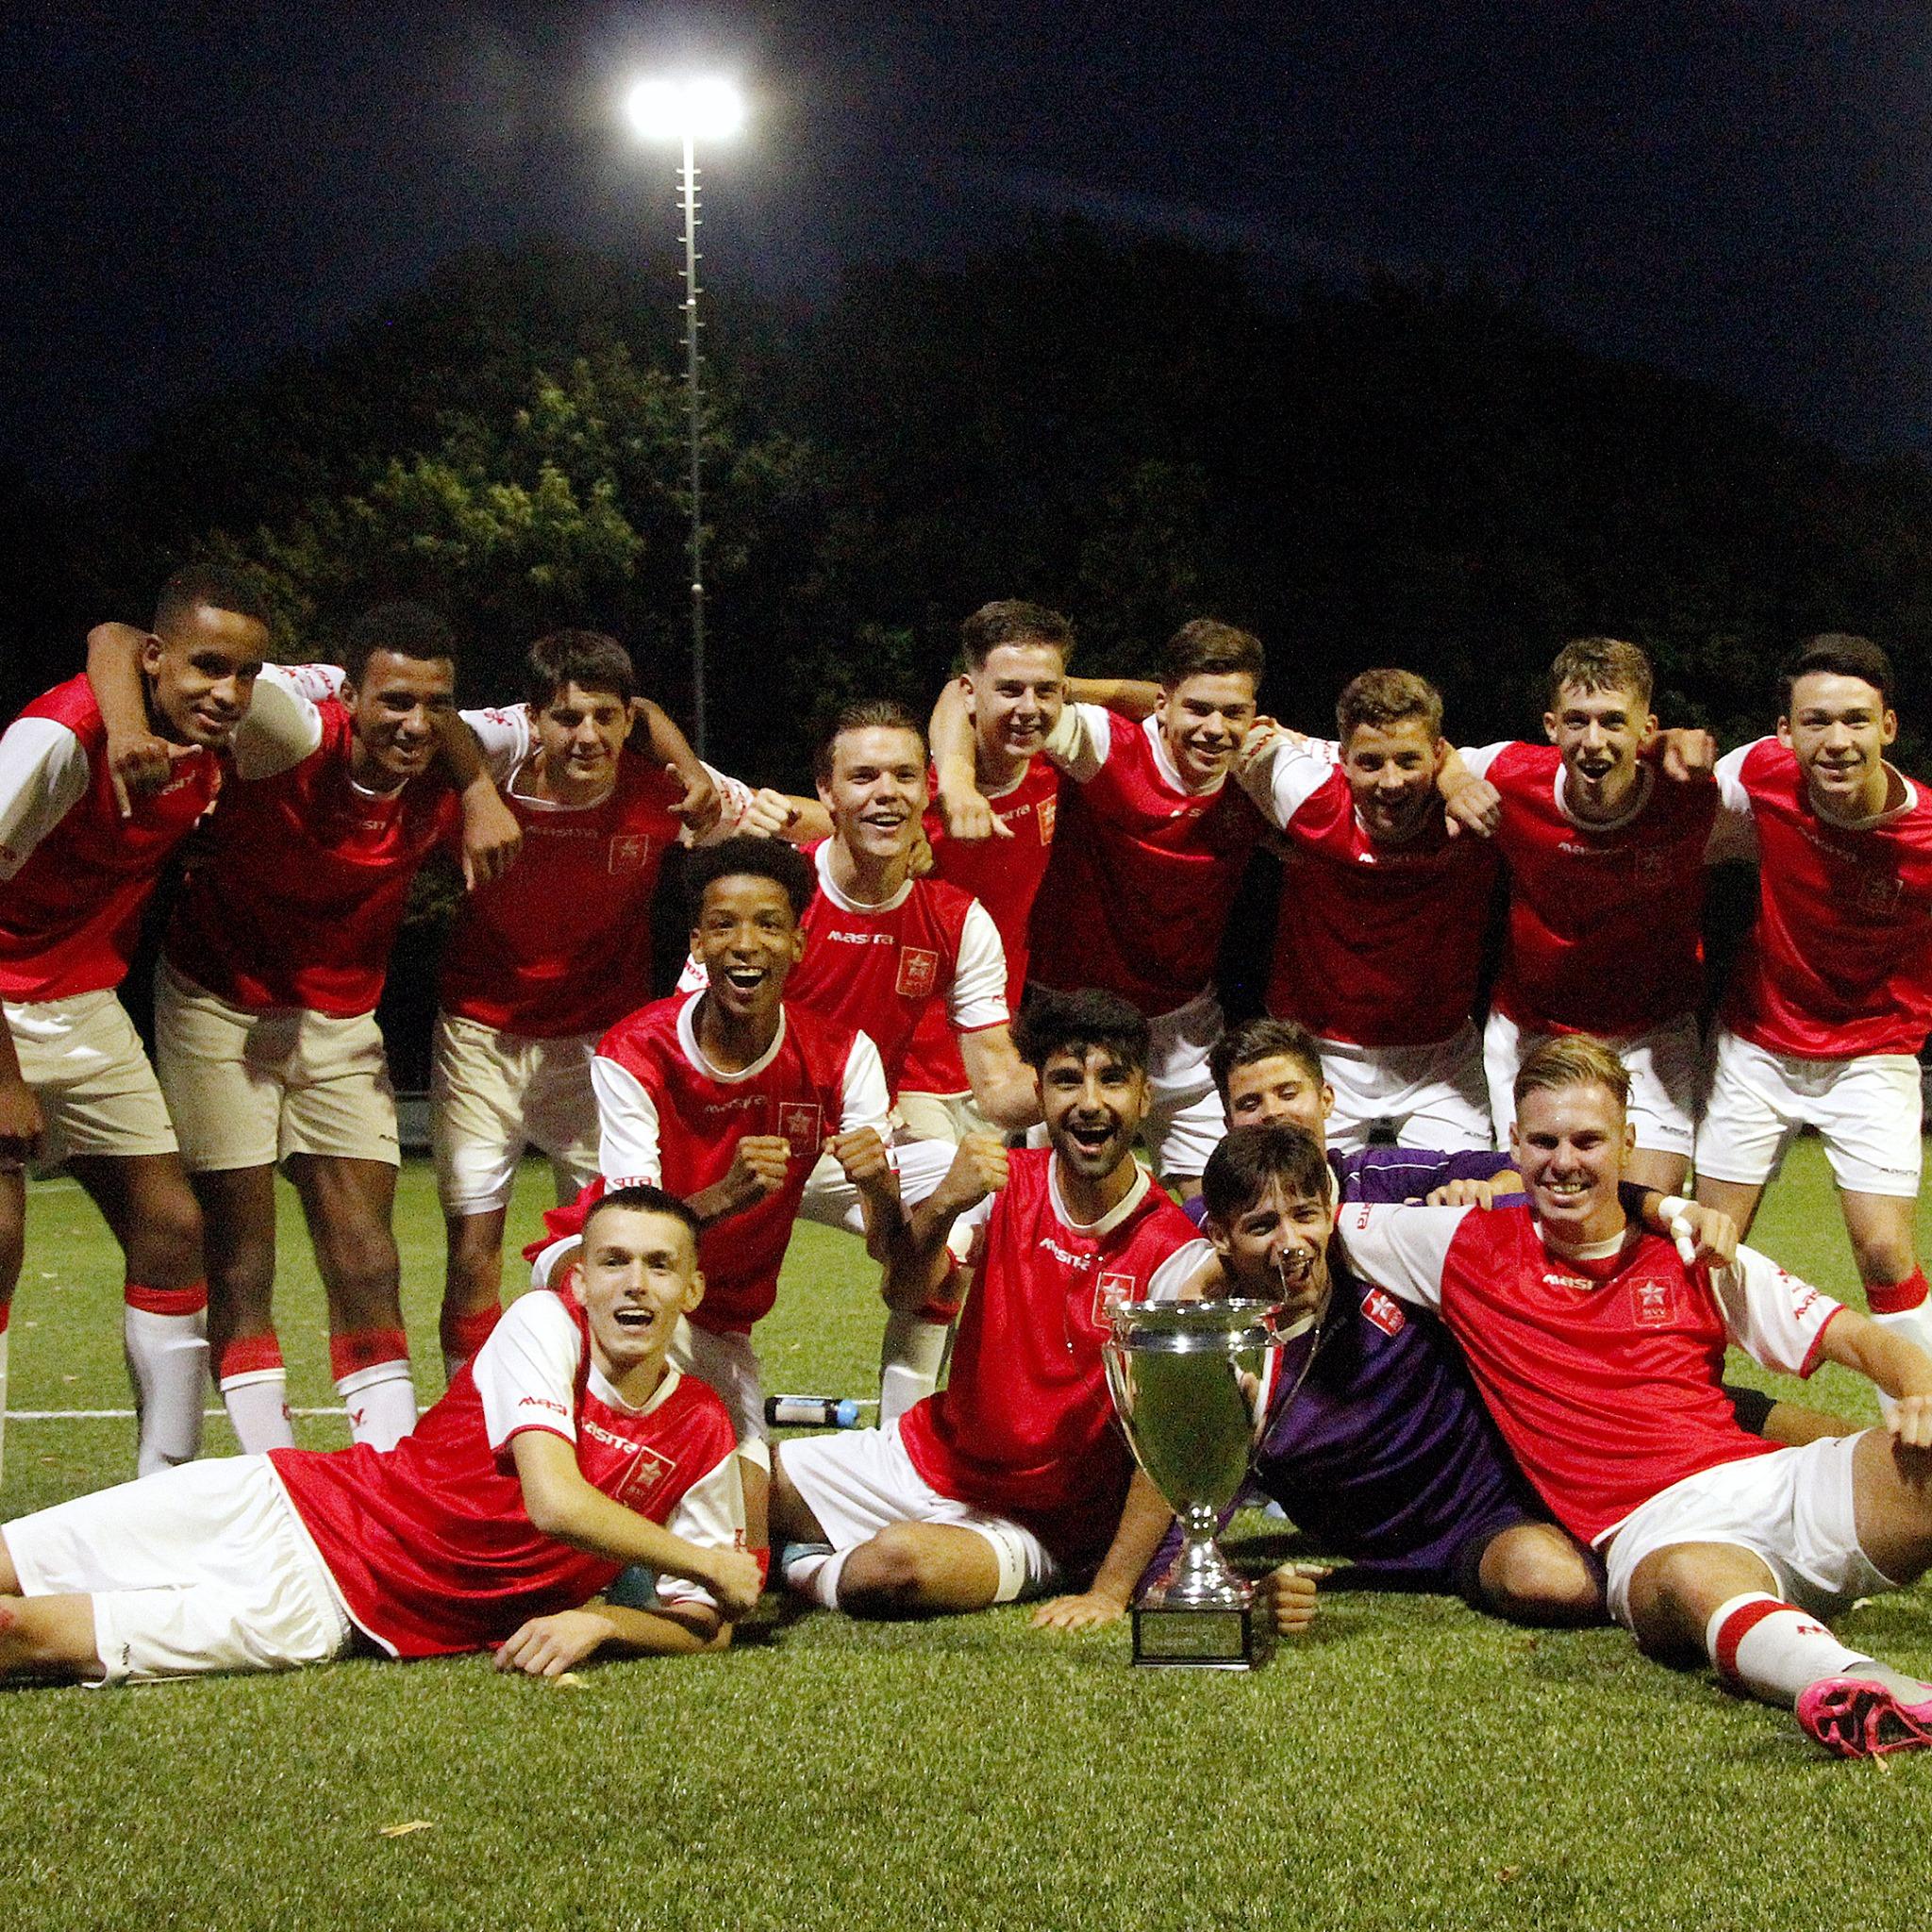 Maastricht Champions Trophy